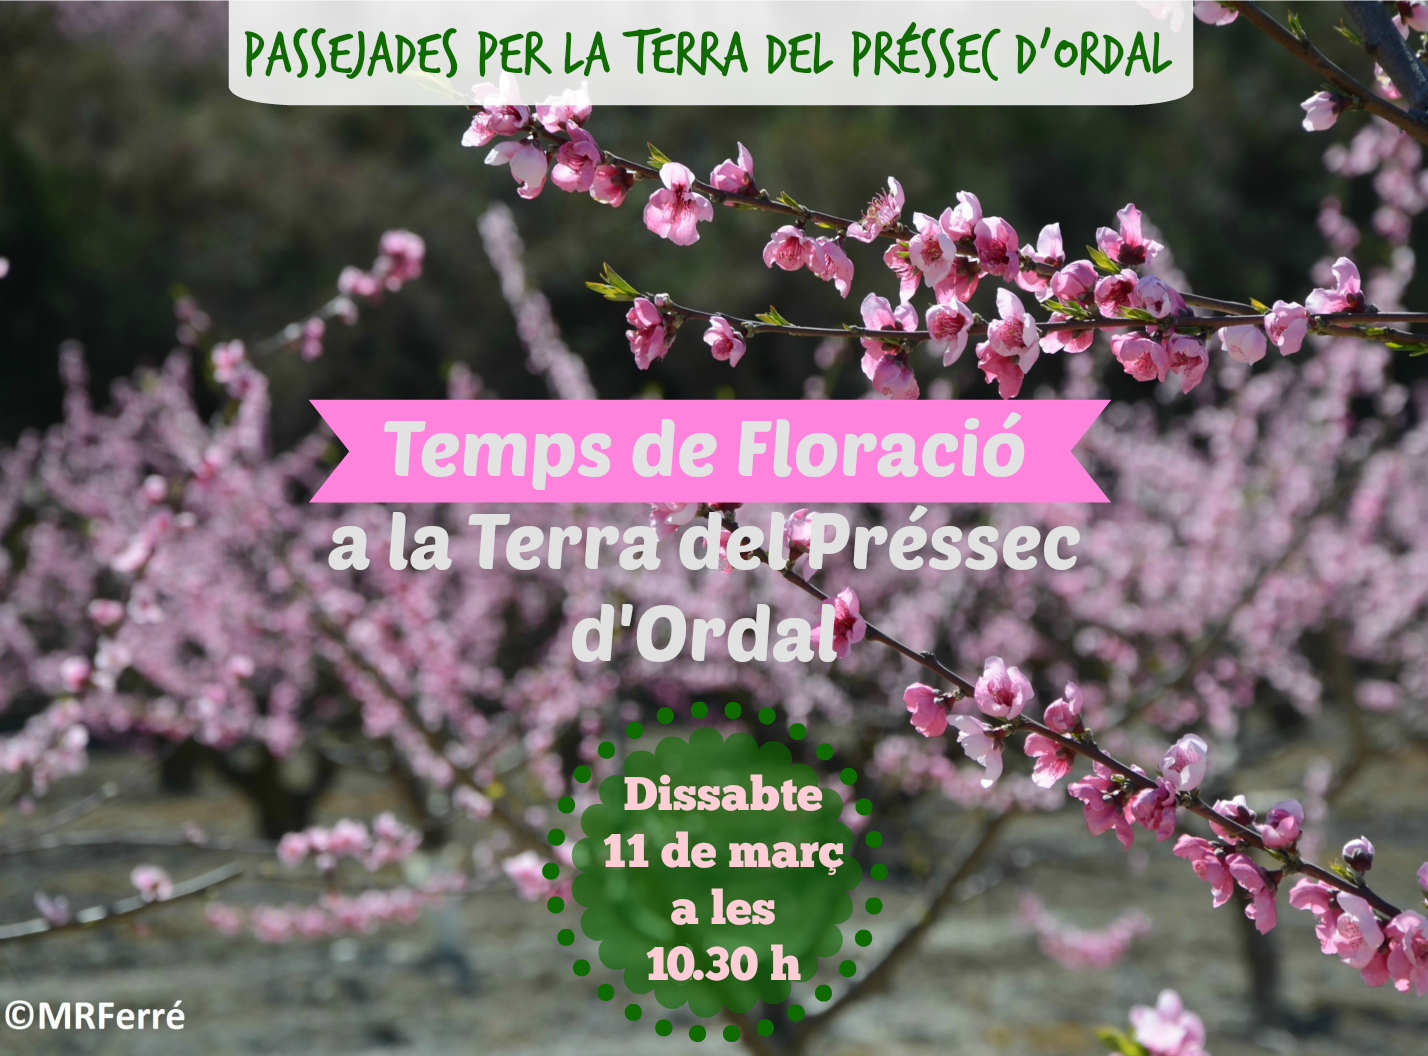 Floracio_MPO3_2